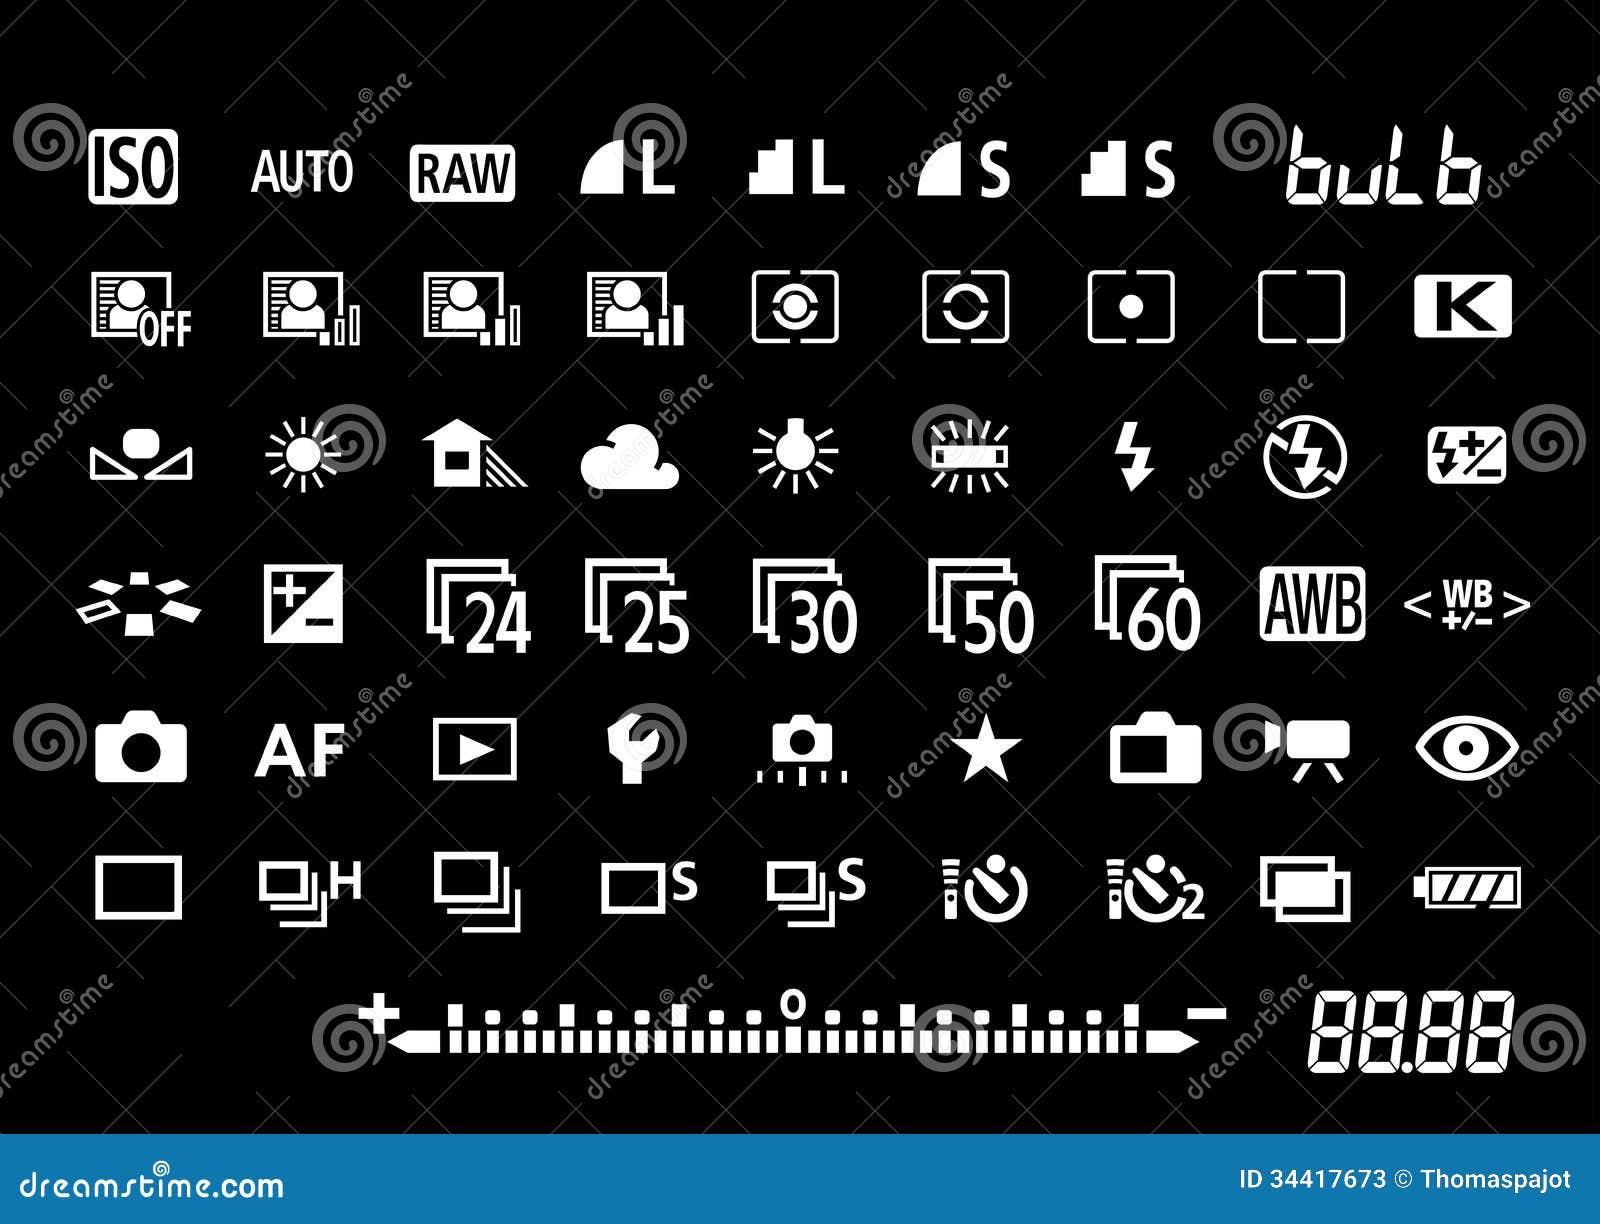 Camera Settings Symbols Stock Photos Image 34417673